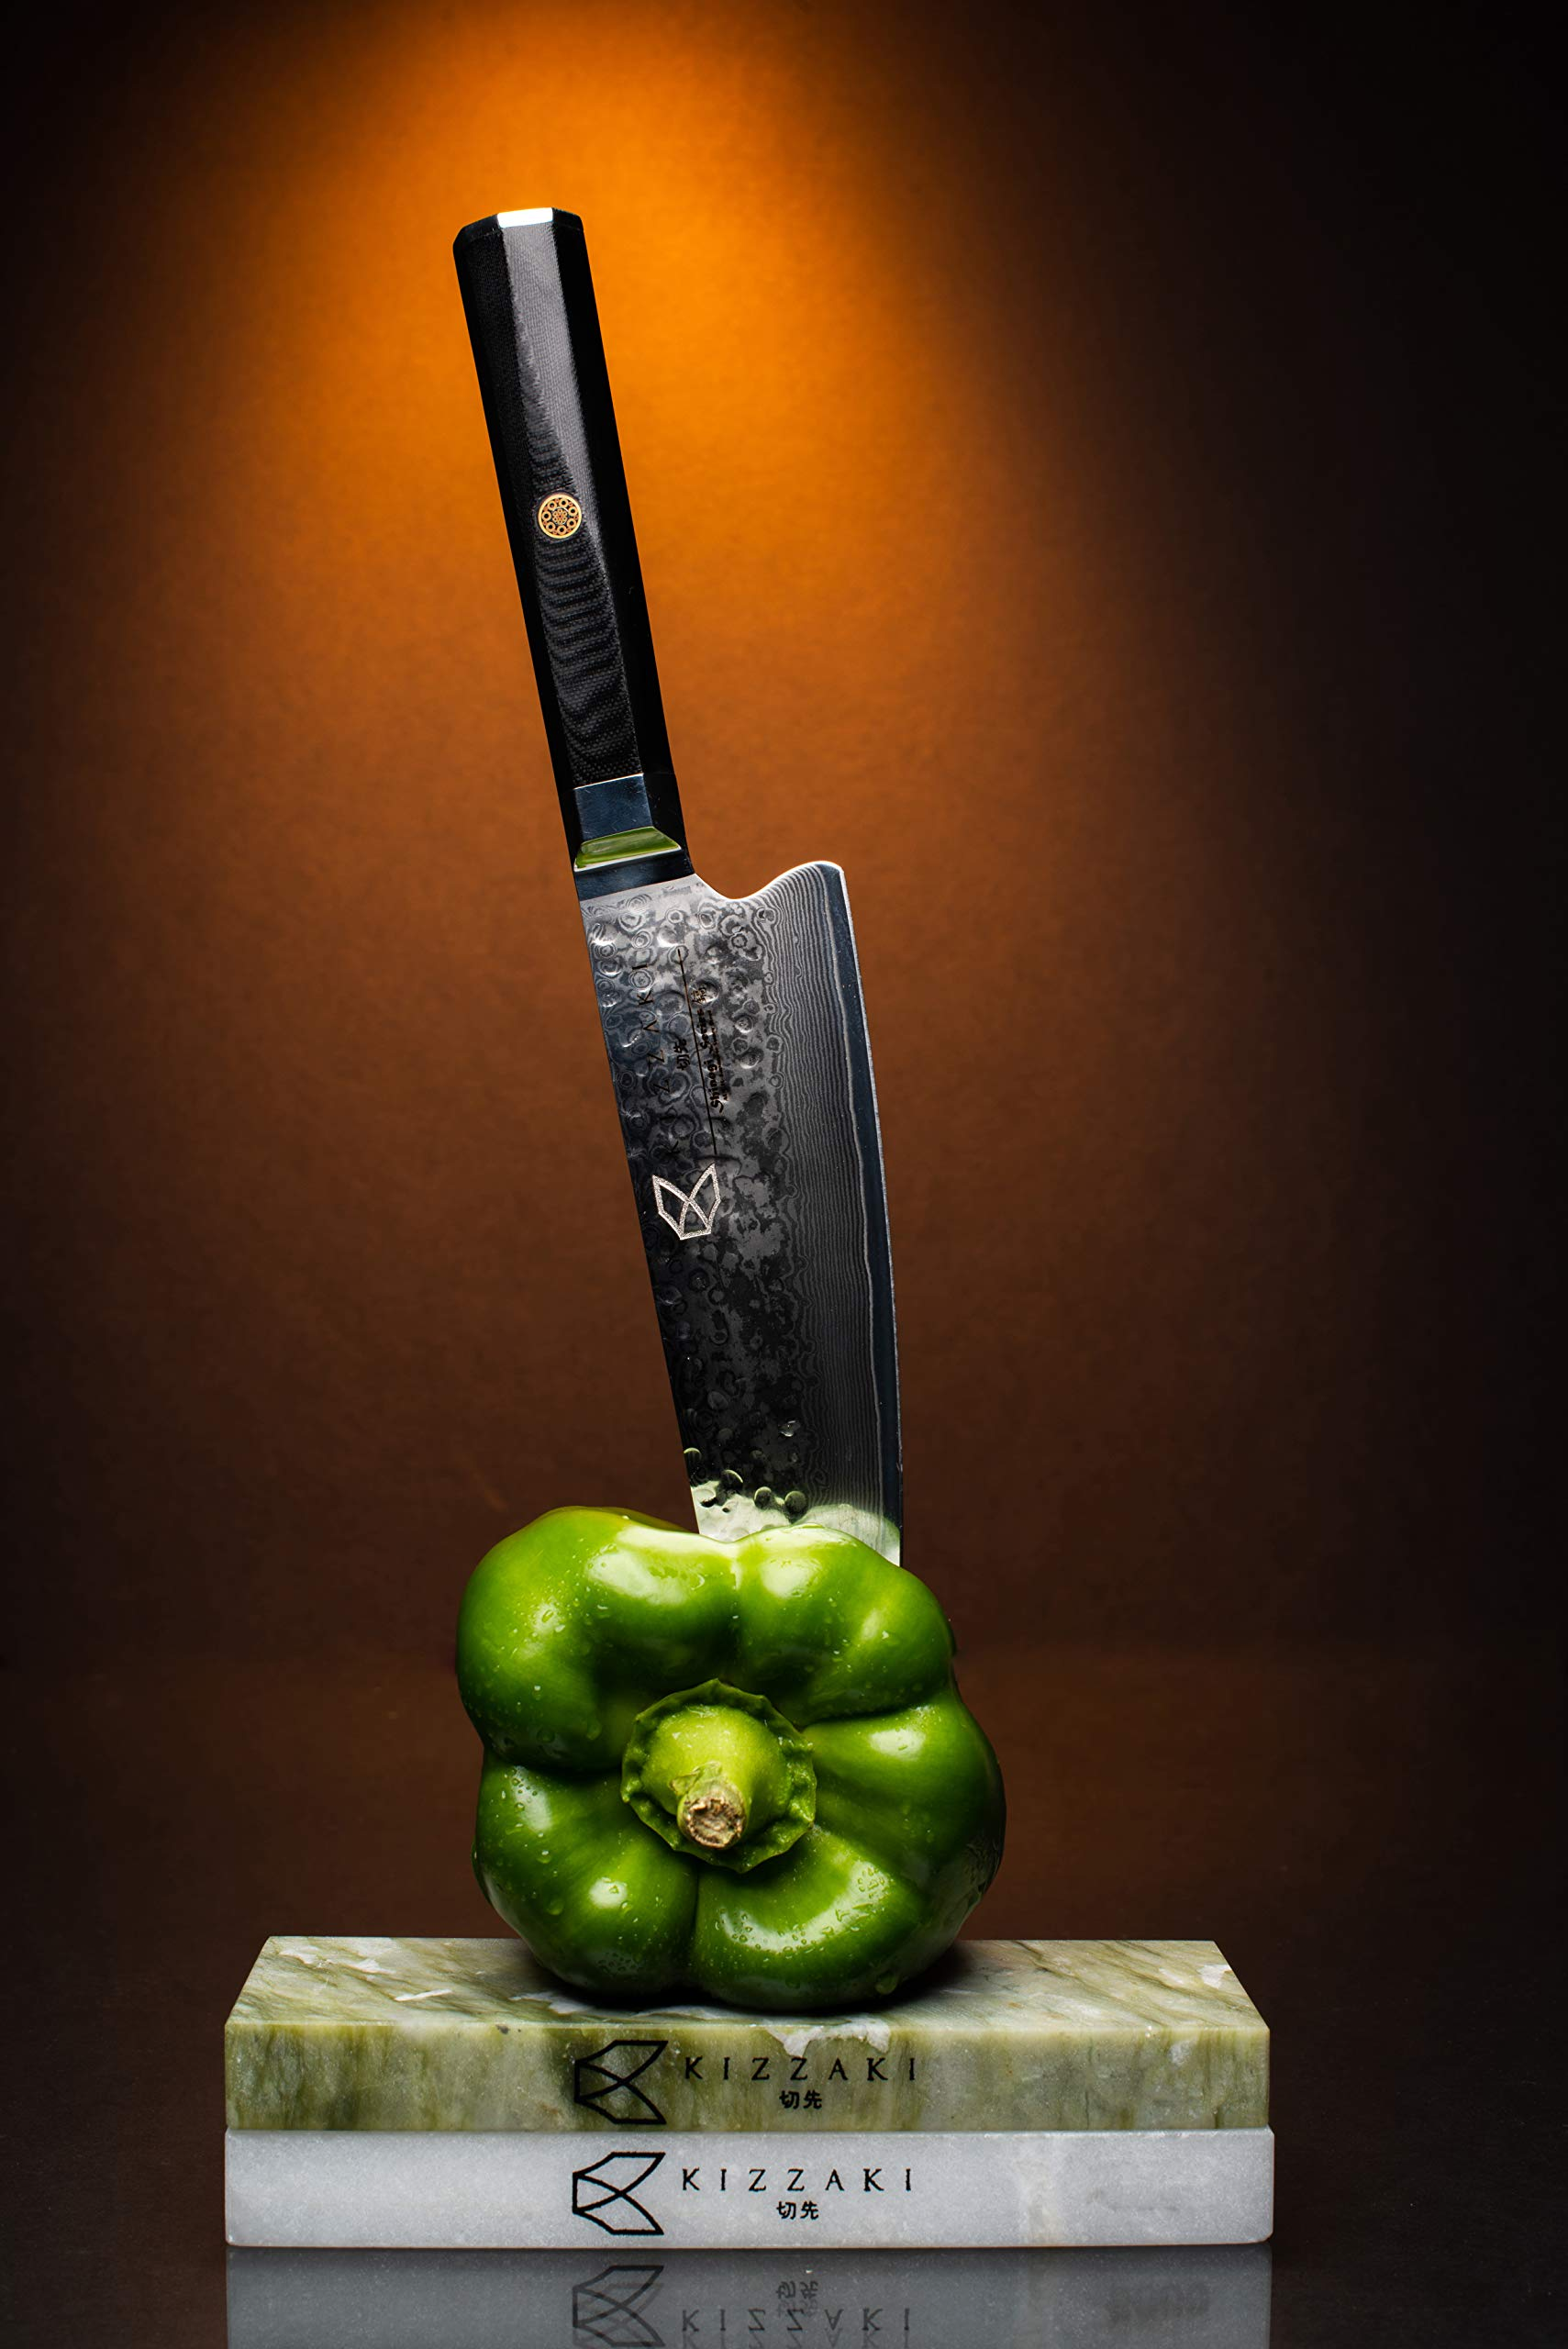 Kizzaki Premium 8 inch AUS-10 Japanese Super Steel Chef Knife - Ultra Sharp Blade - Hammered - Damascus Pattern - Acacia Wooden Sheath - Steel Soap - Magnetic Gift Box by Kizzaki (Image #4)